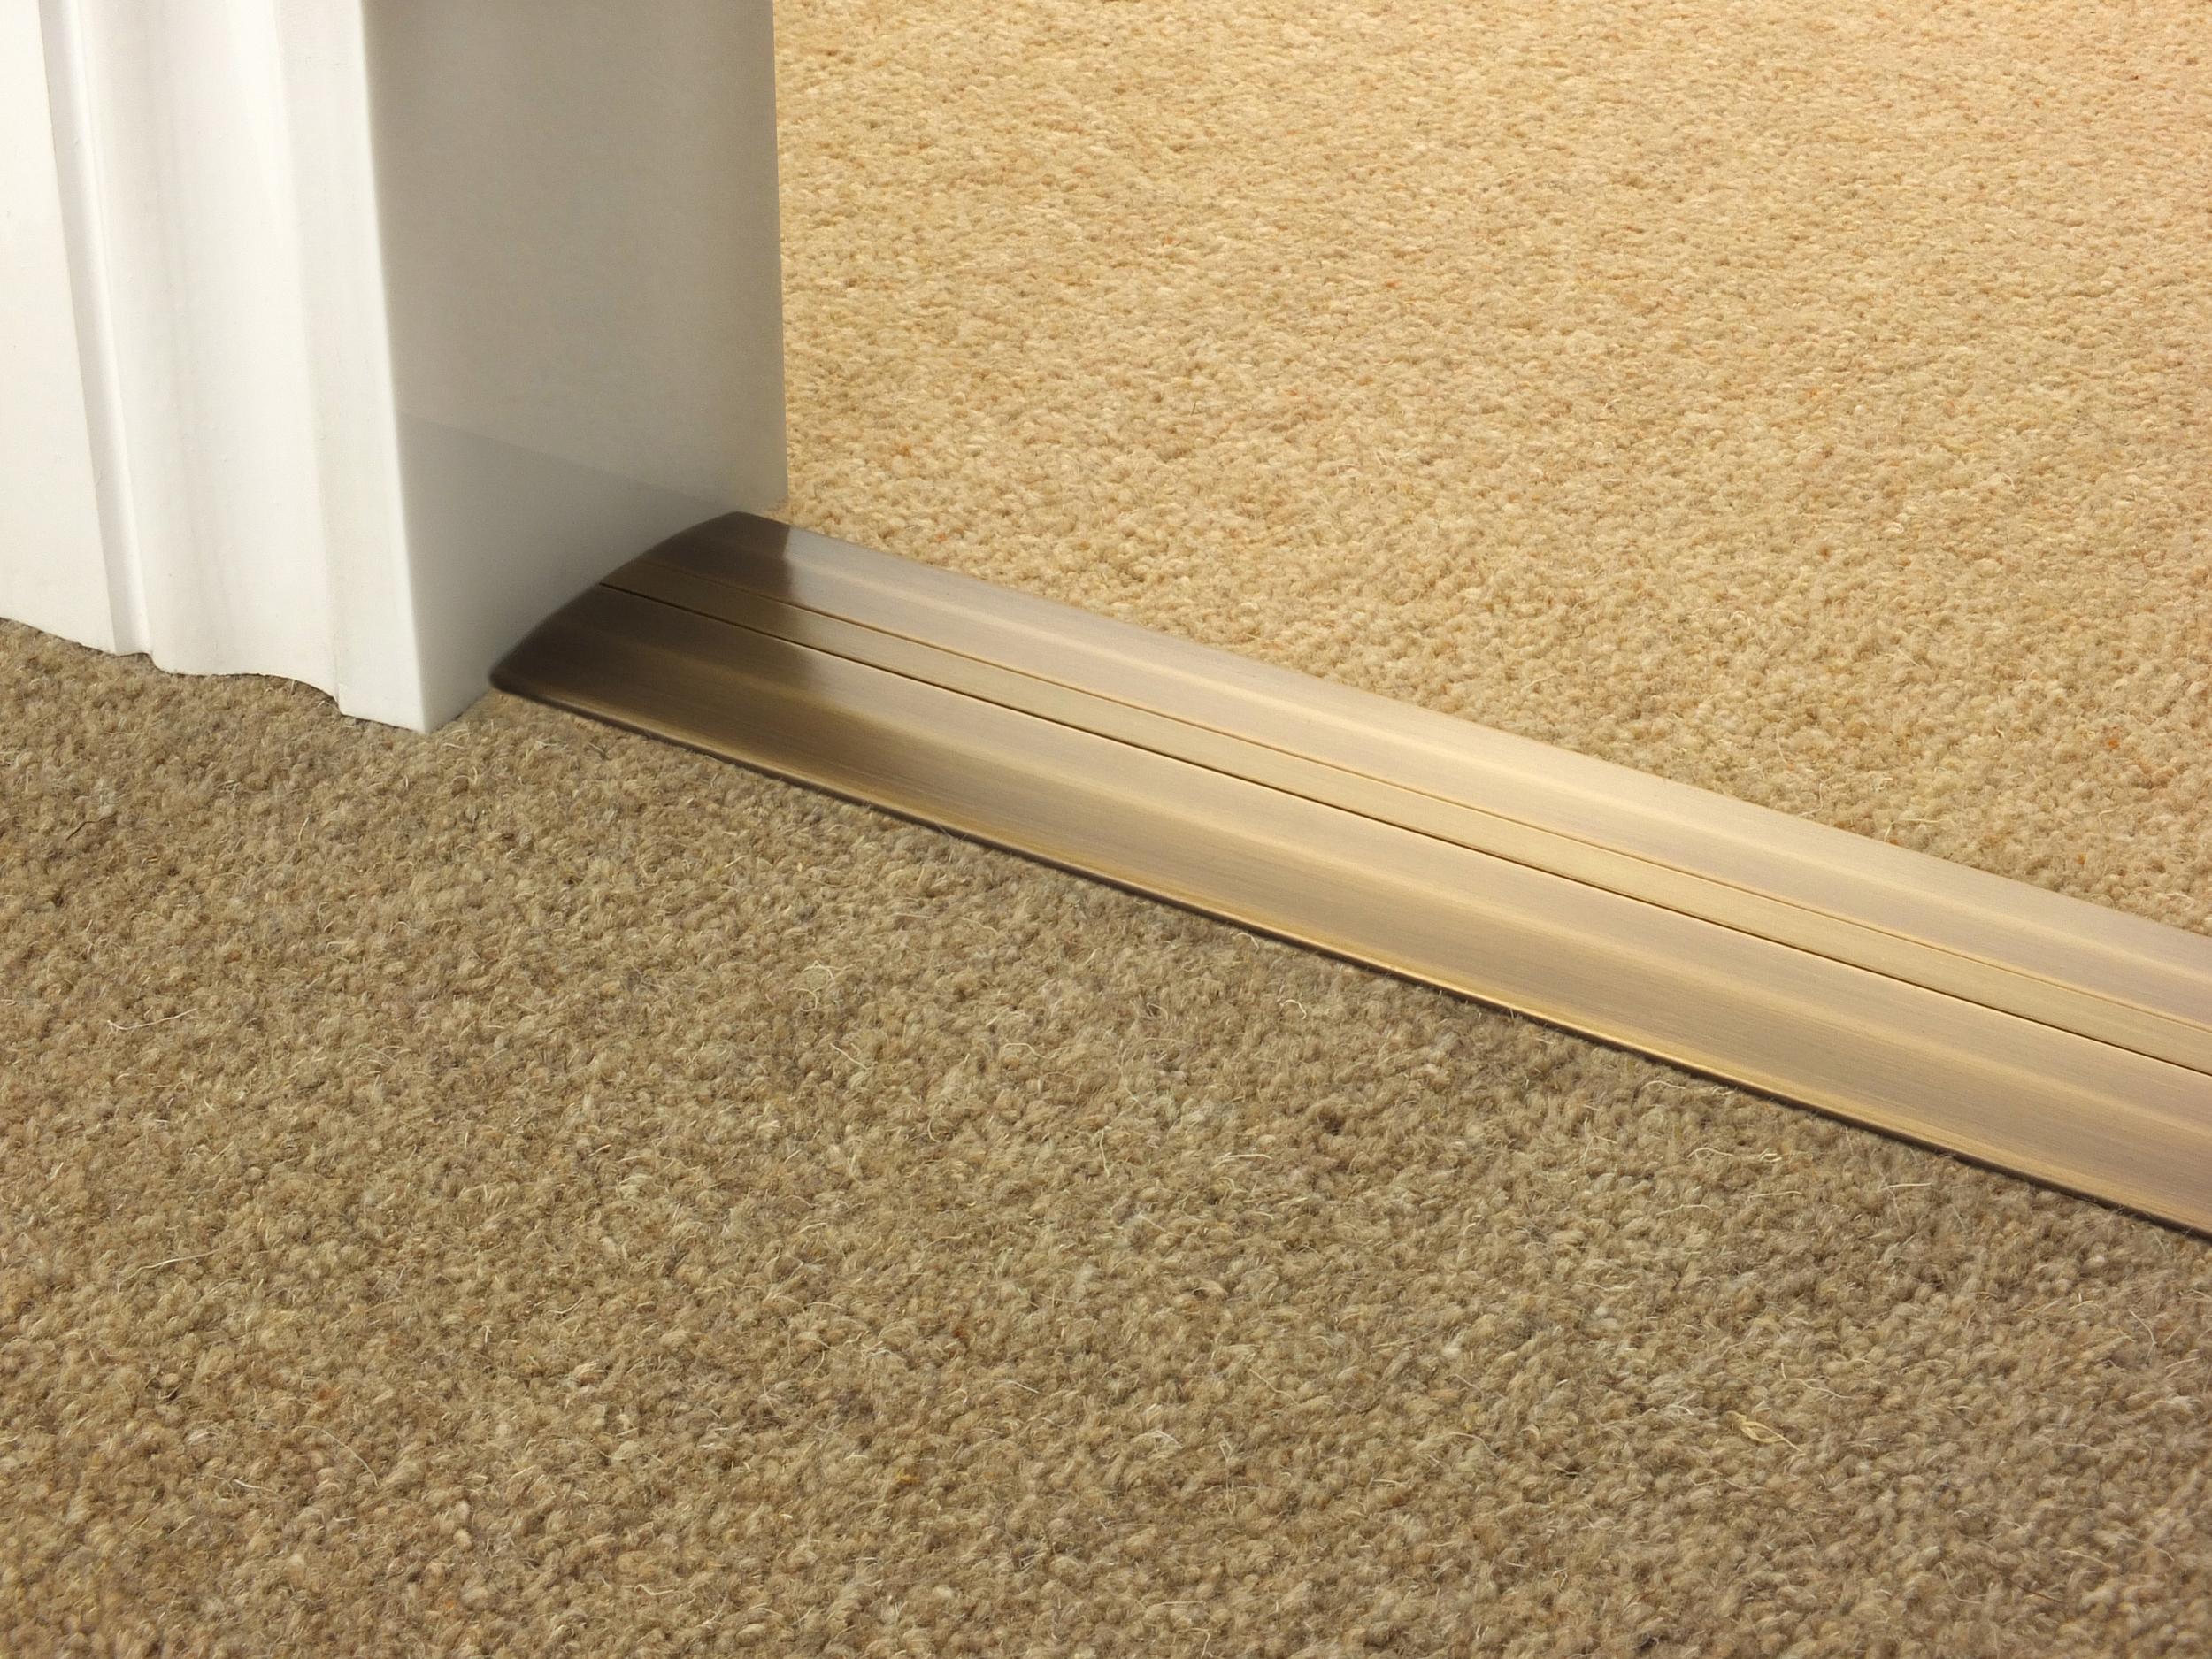 door_bar_antique_brass_posh55_carpet_carpet.jpg